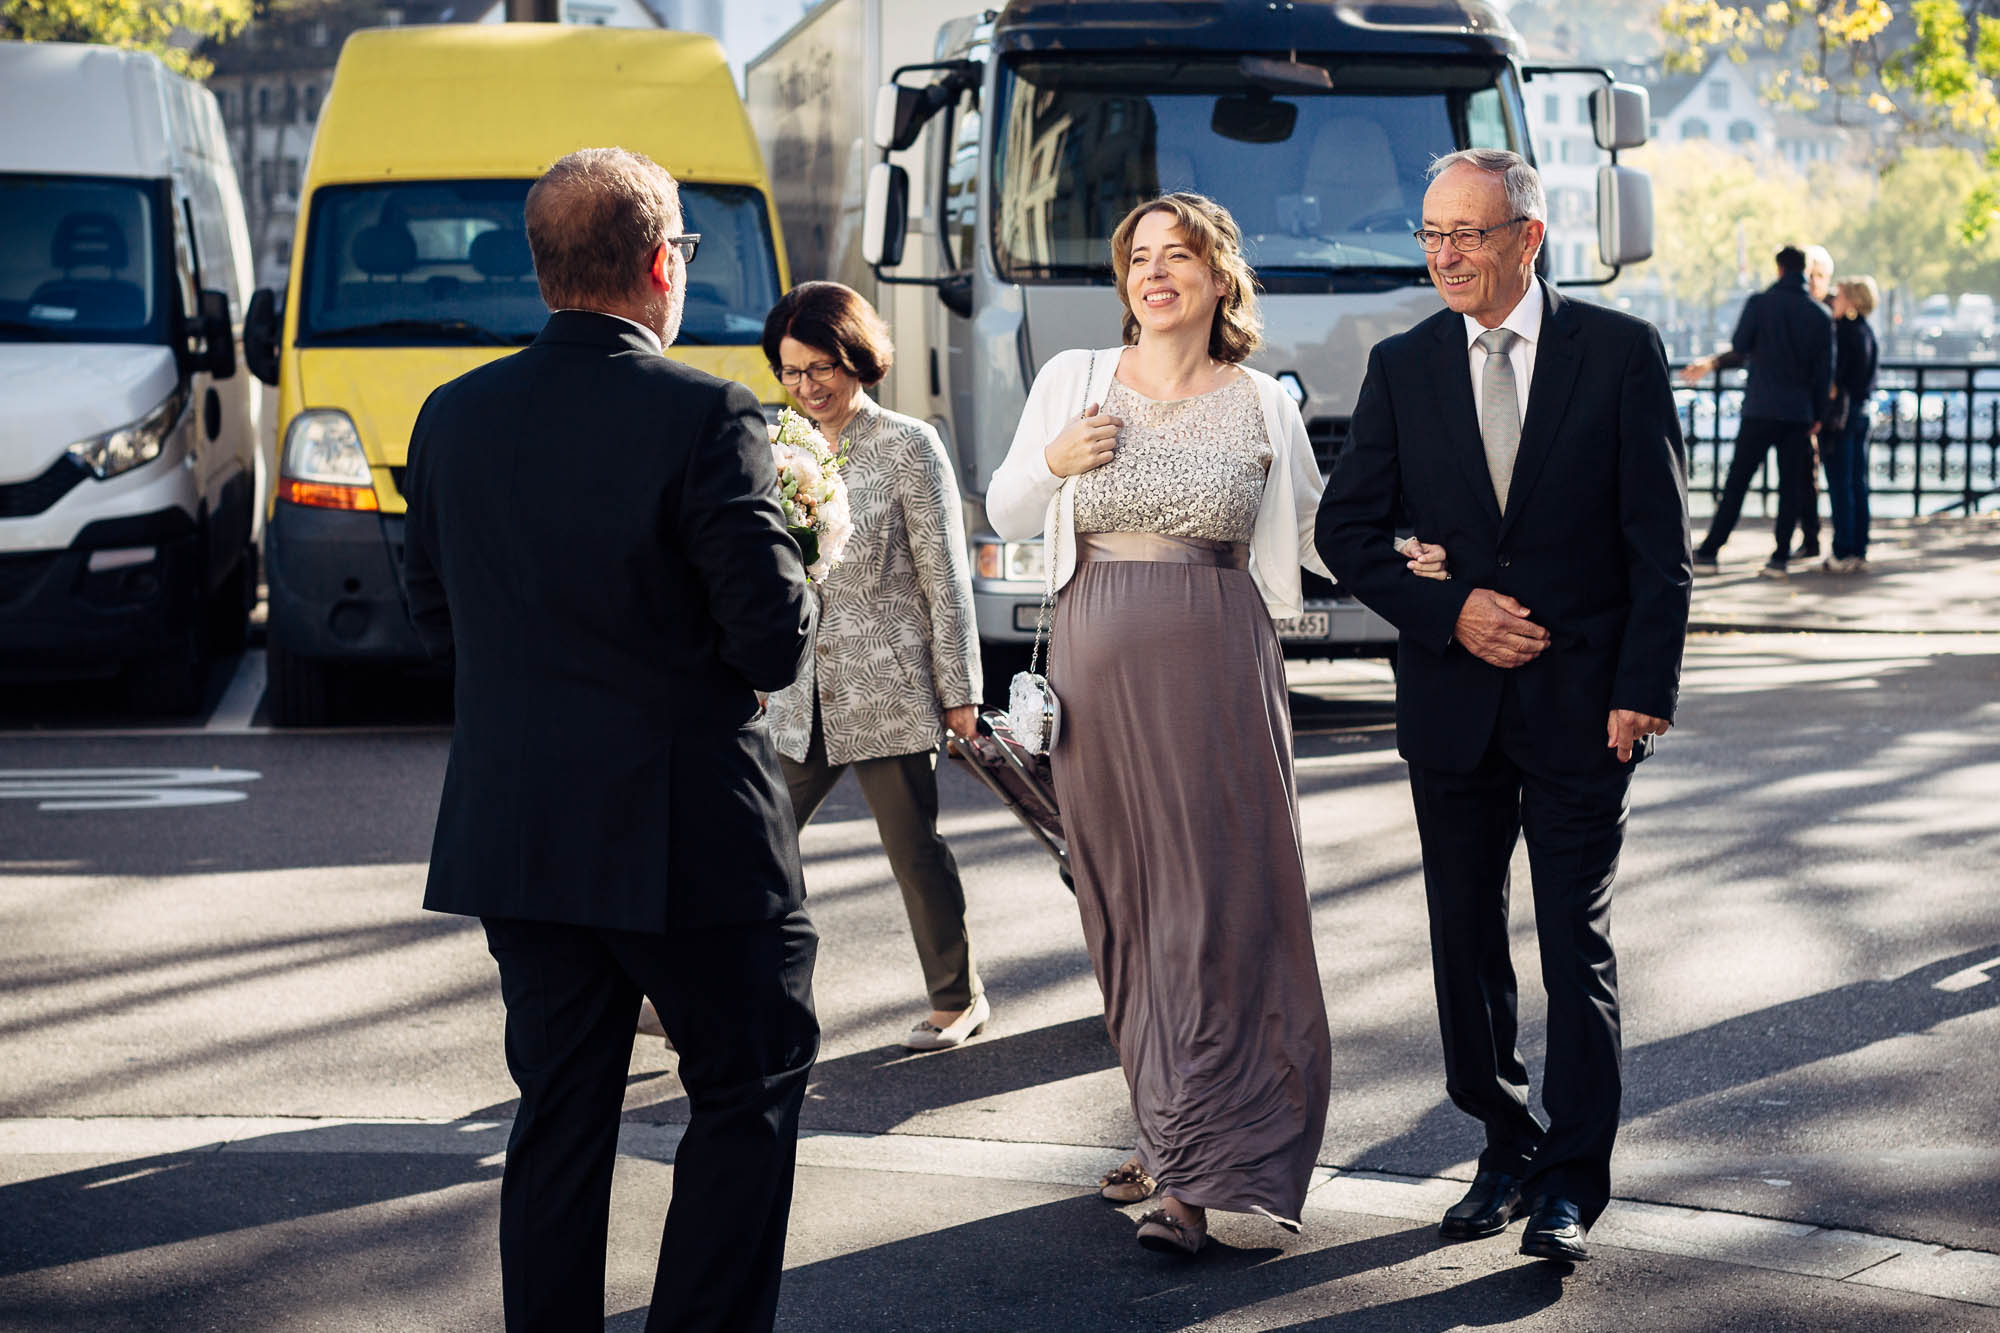 Bräutigam empfängt Braut mit Brautstrauss